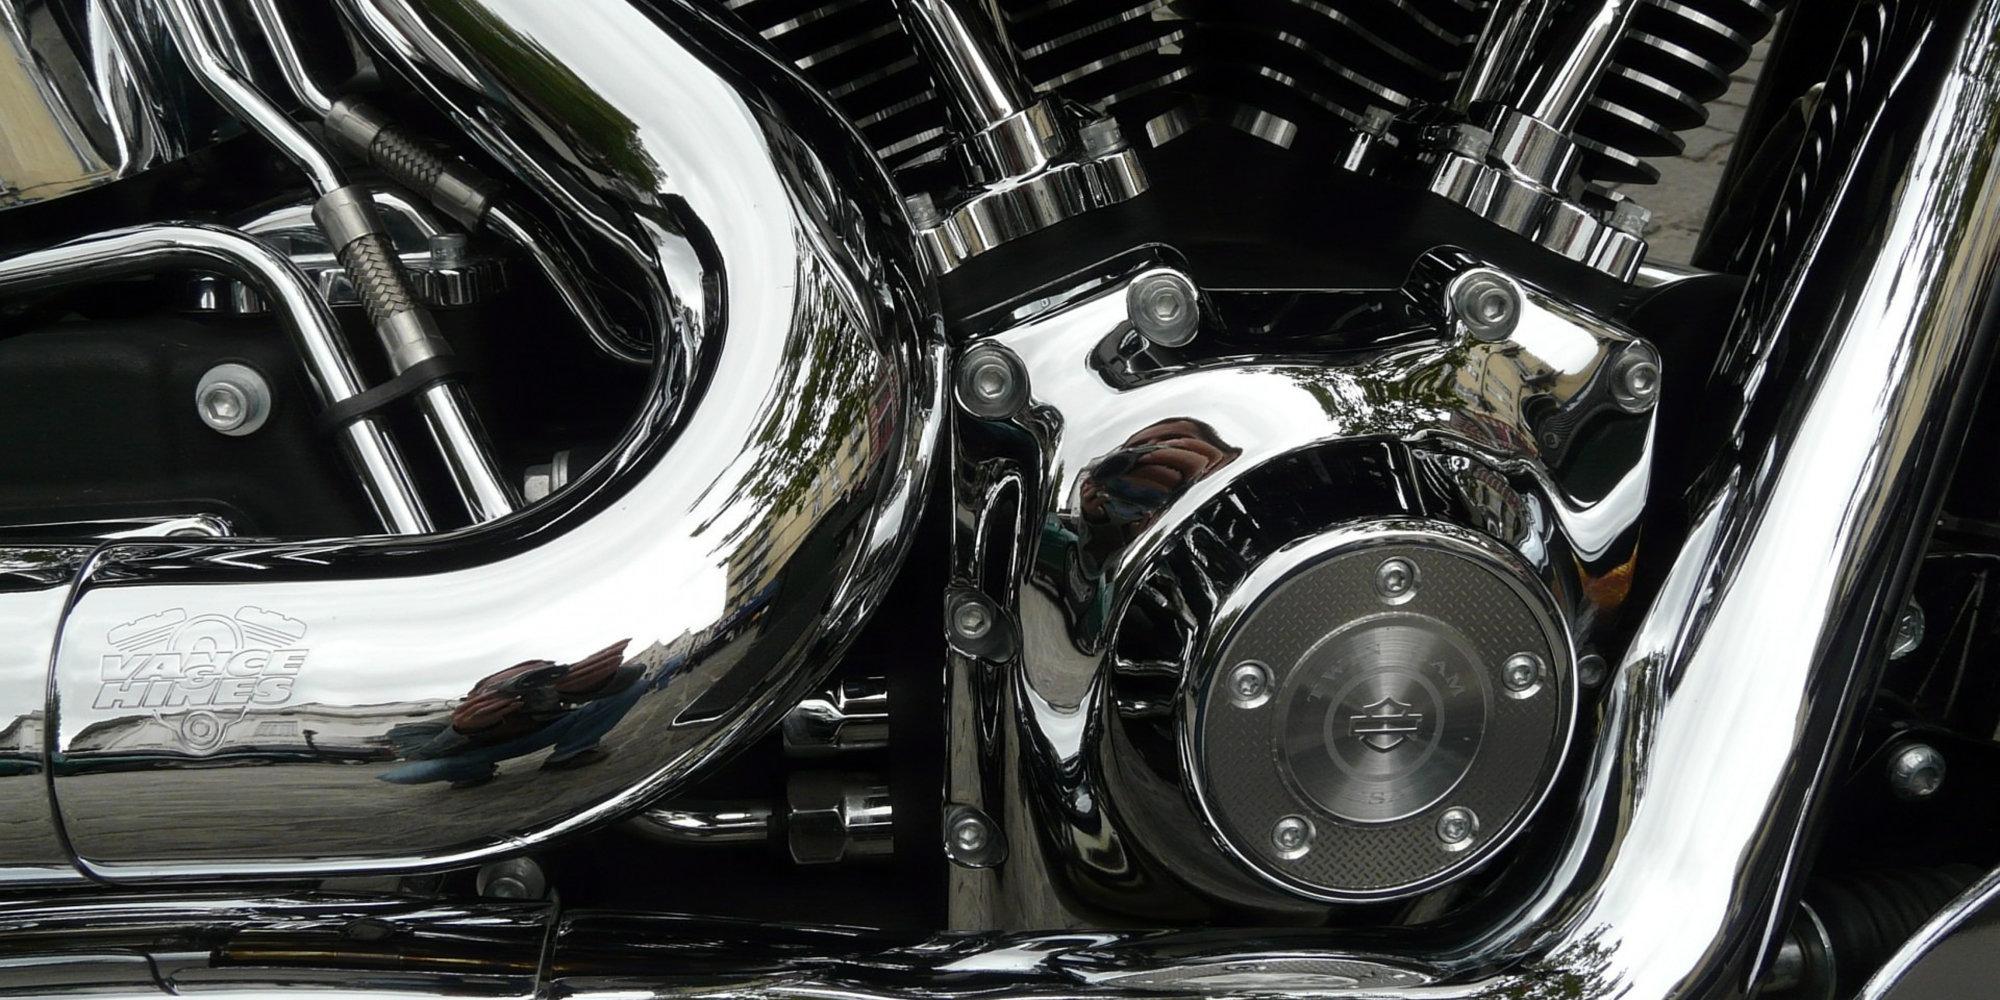 AVIVA Motorbike Insurance